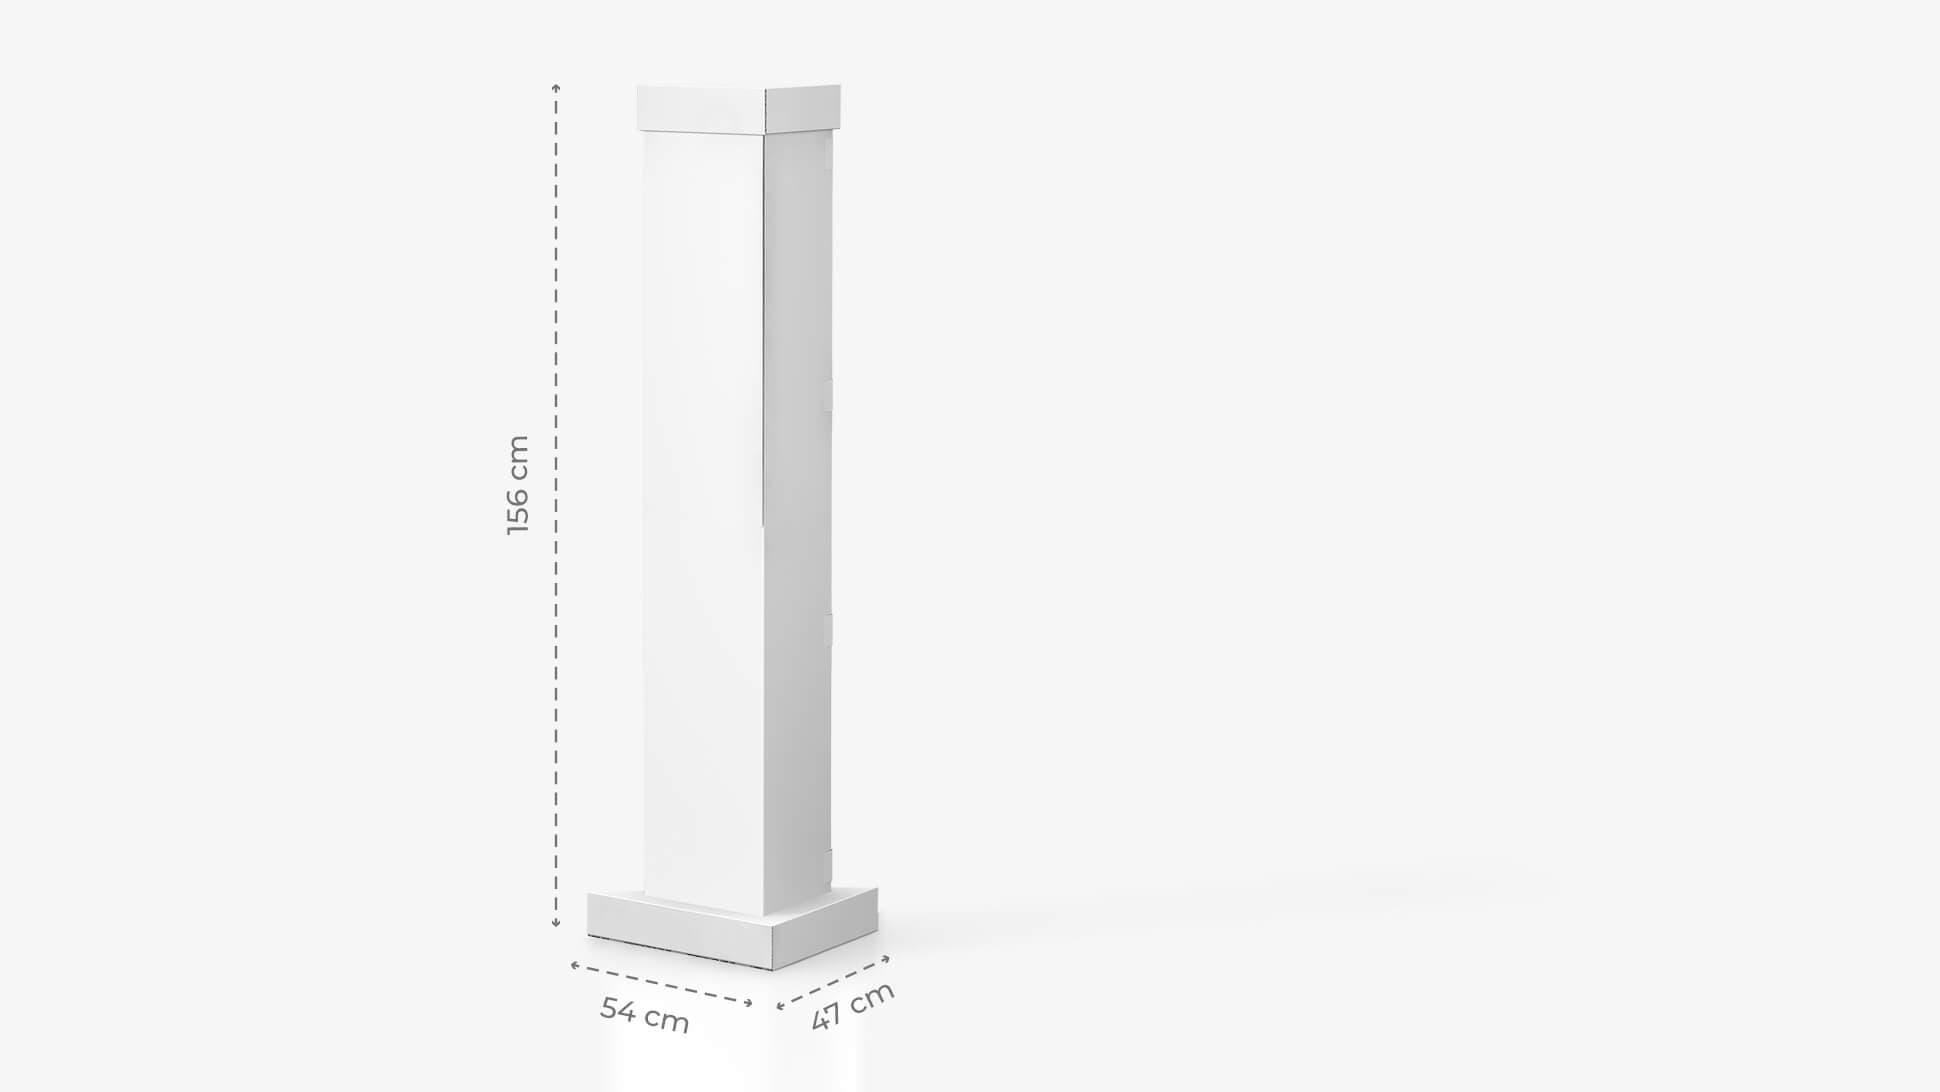 Totem in cartone personalizzabile 156x54 cm | tictac.it